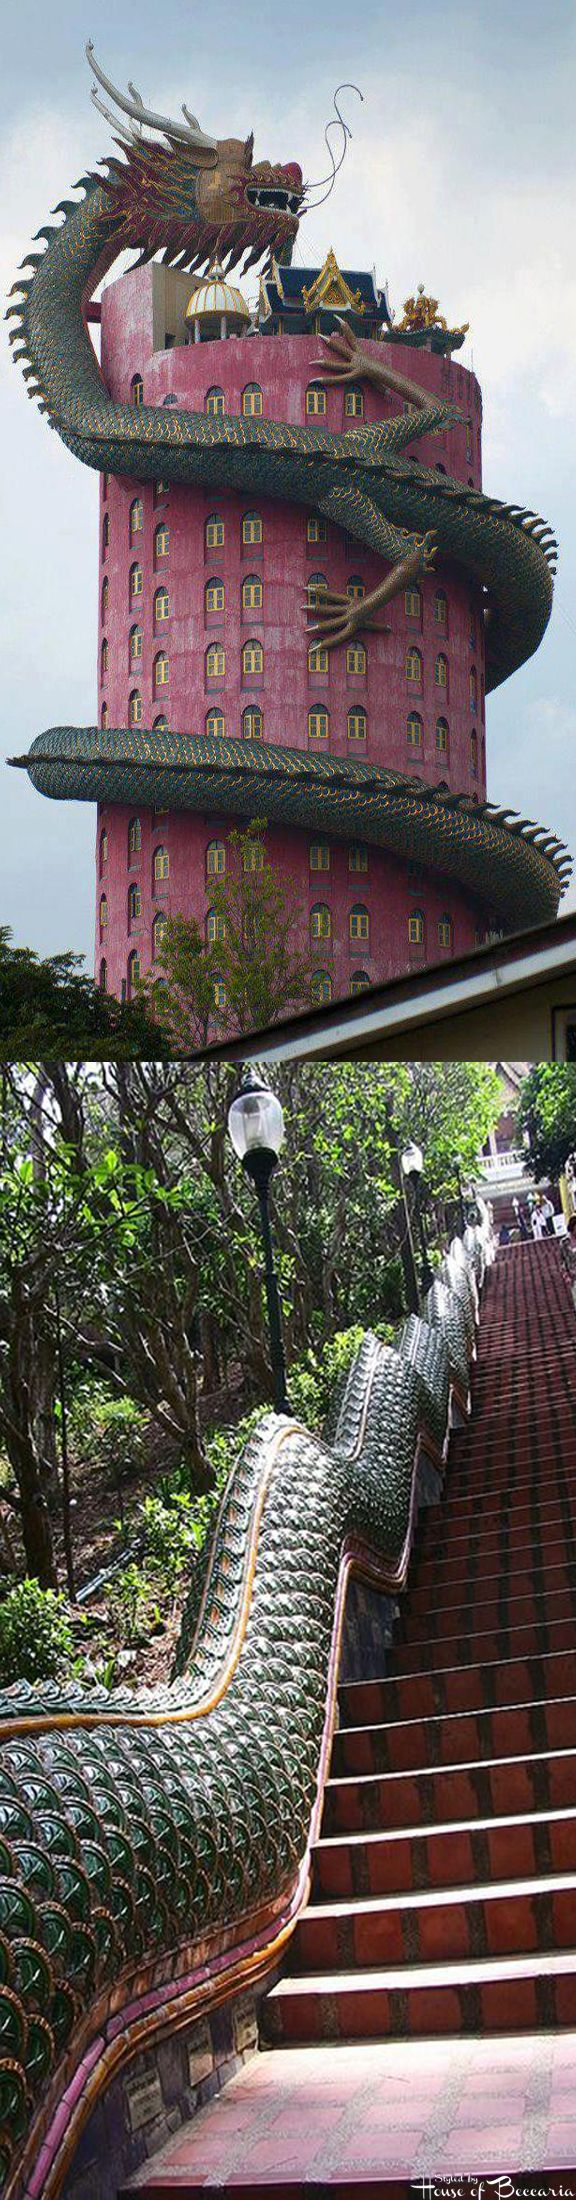 ~Thailand, Chiang Mai, Wat Phra That Doi Suthep, Nagatreppe hinauf zum Tempel   House of Beccaria